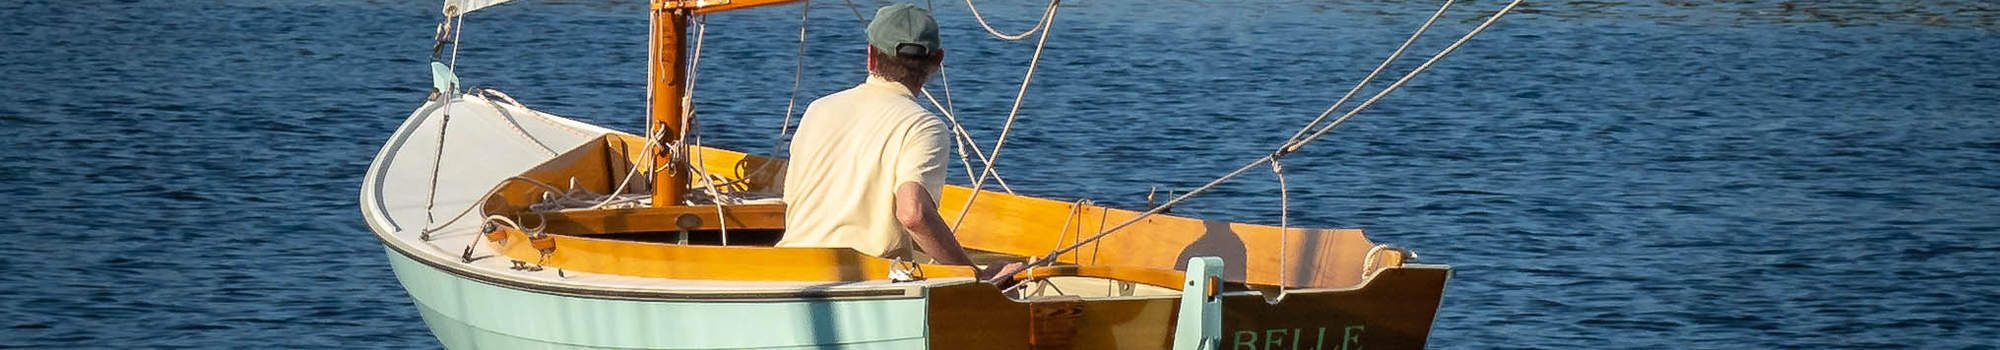 BELLE sailing